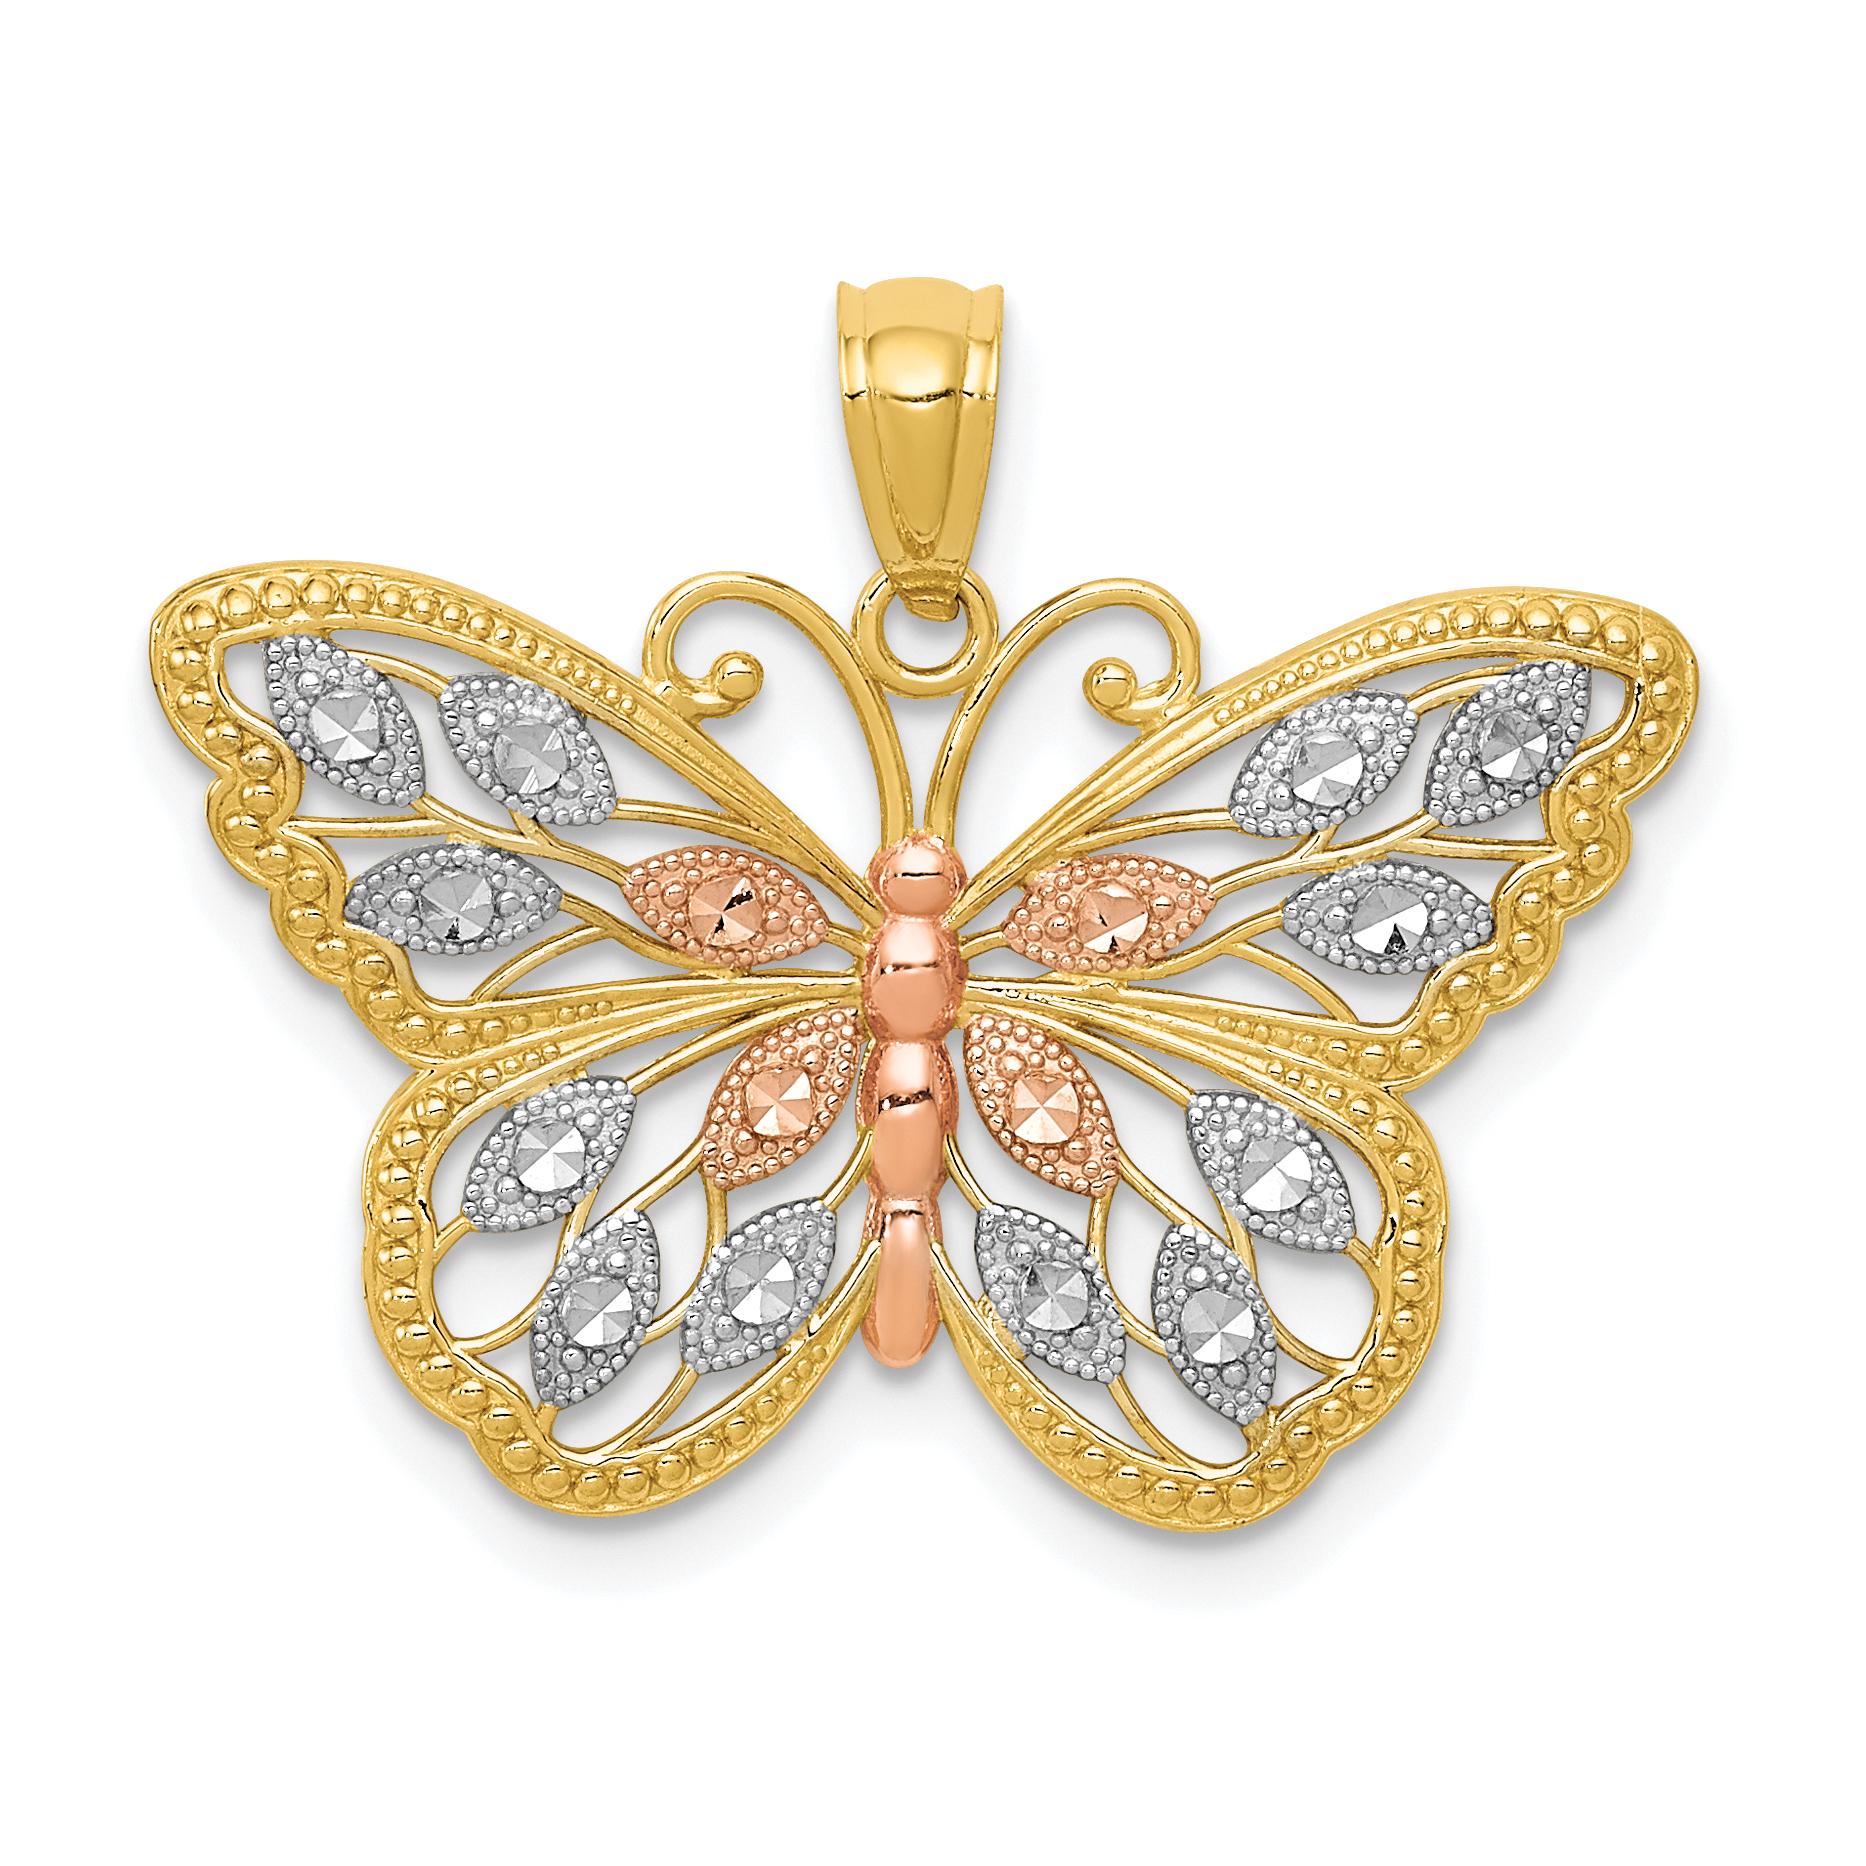 14k Yellow Gold White Rhodium Mini Cross Pendant Religious Charm Textured Sparkly Cuts